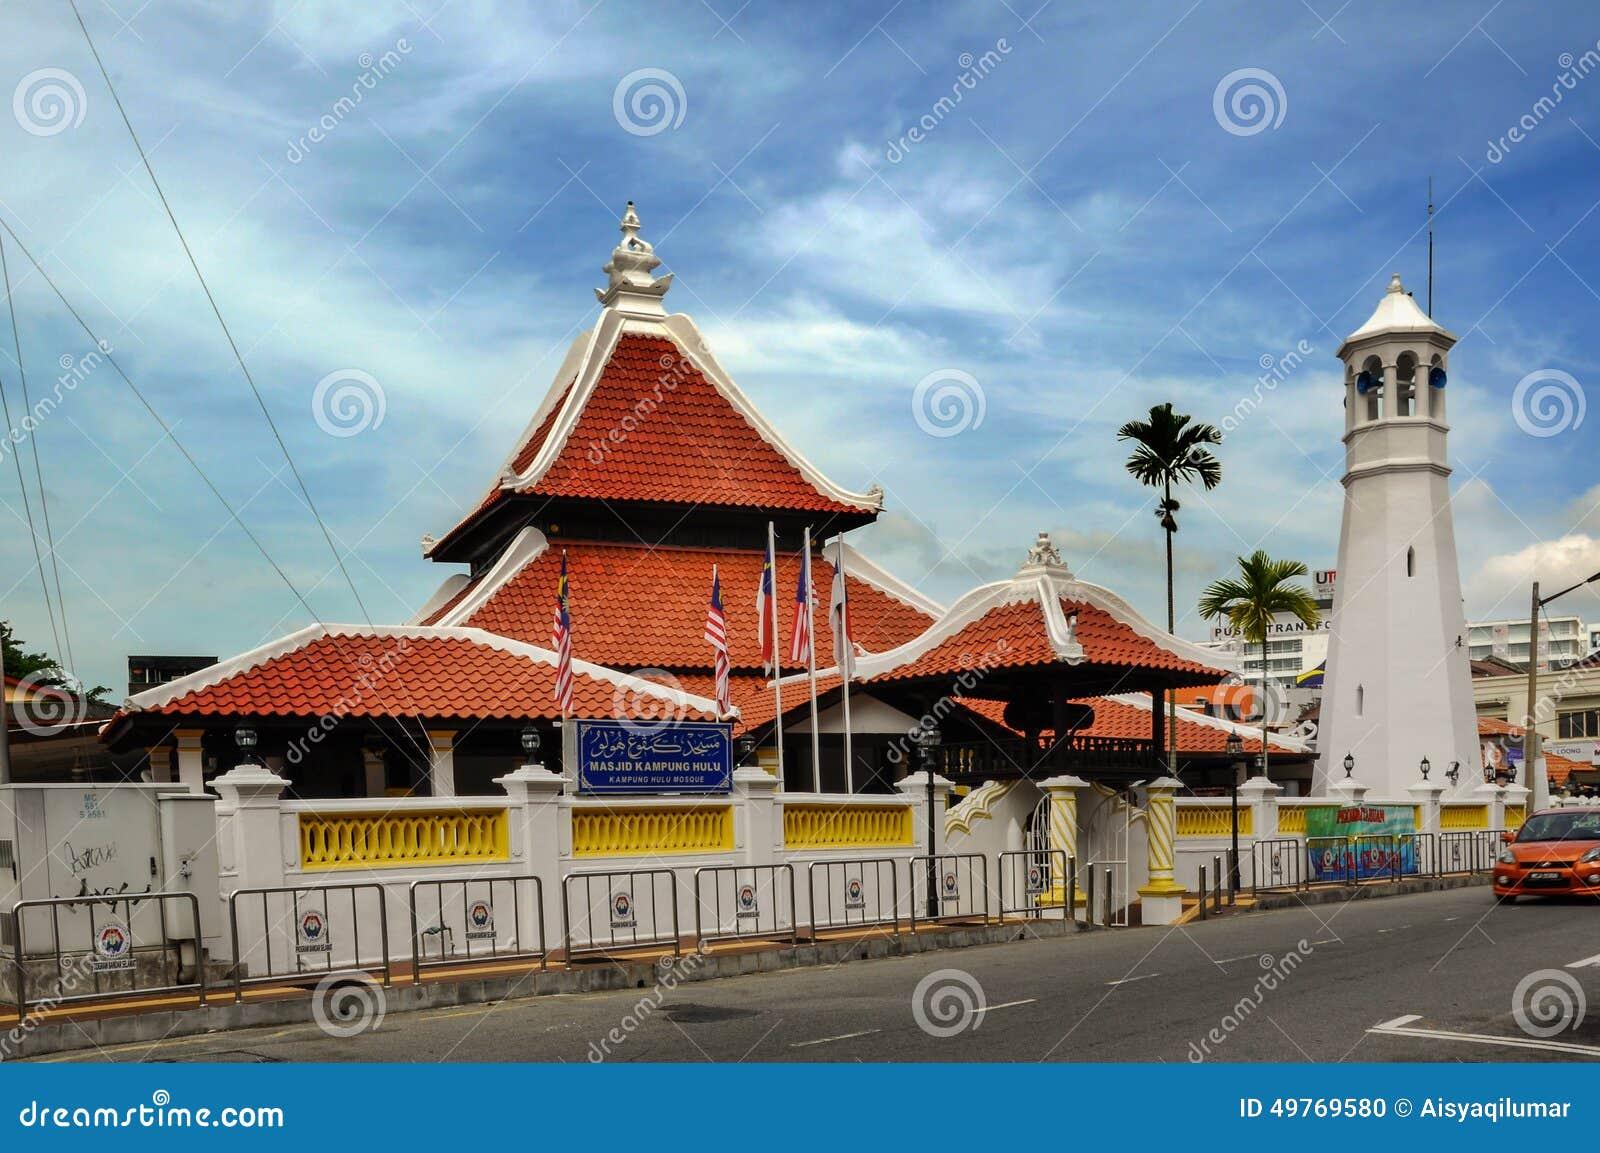 Masjid Kampung Hulu In Malacca Malaysia Editorial Image Image Of Arch Complex 49769580